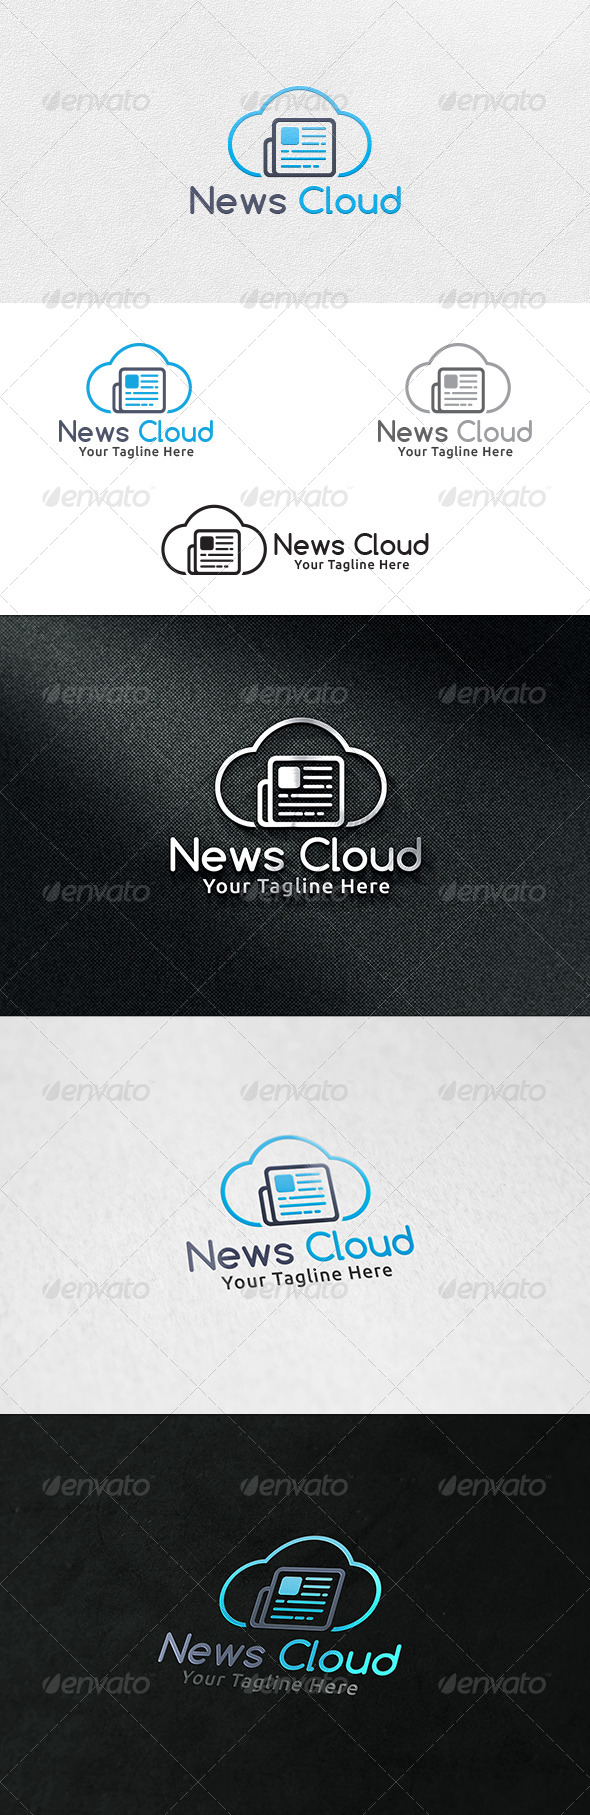 GraphicRiver News Cloud Logo Template 7128556